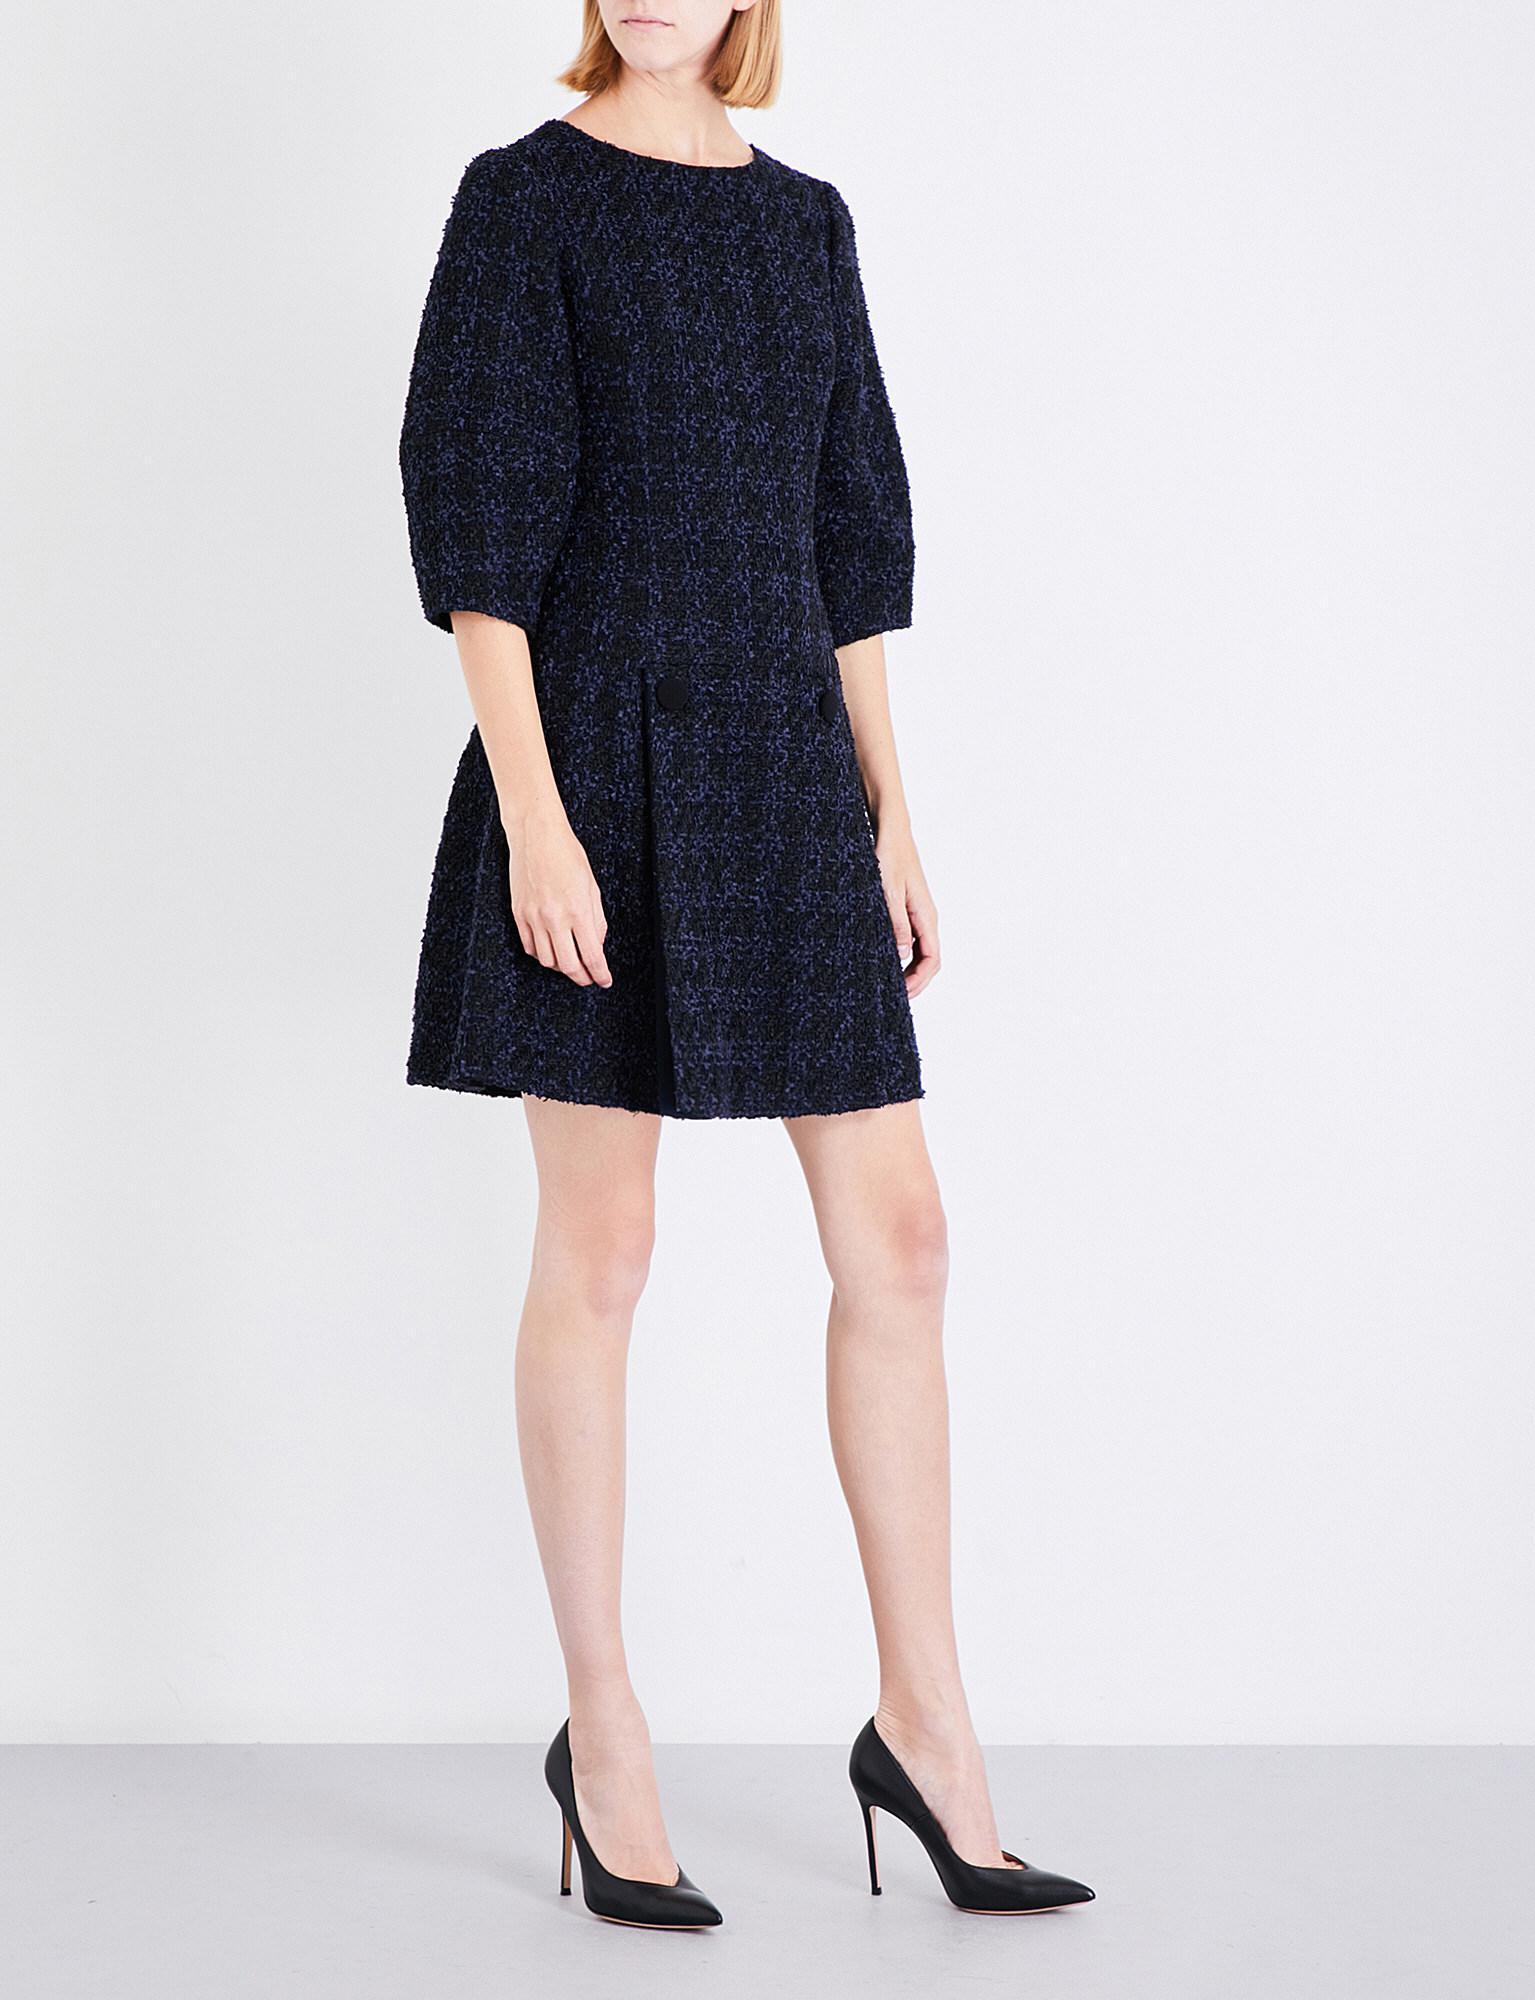 balloon-sleeve mini dresss - Black Oscar De La Renta e3R3qyi